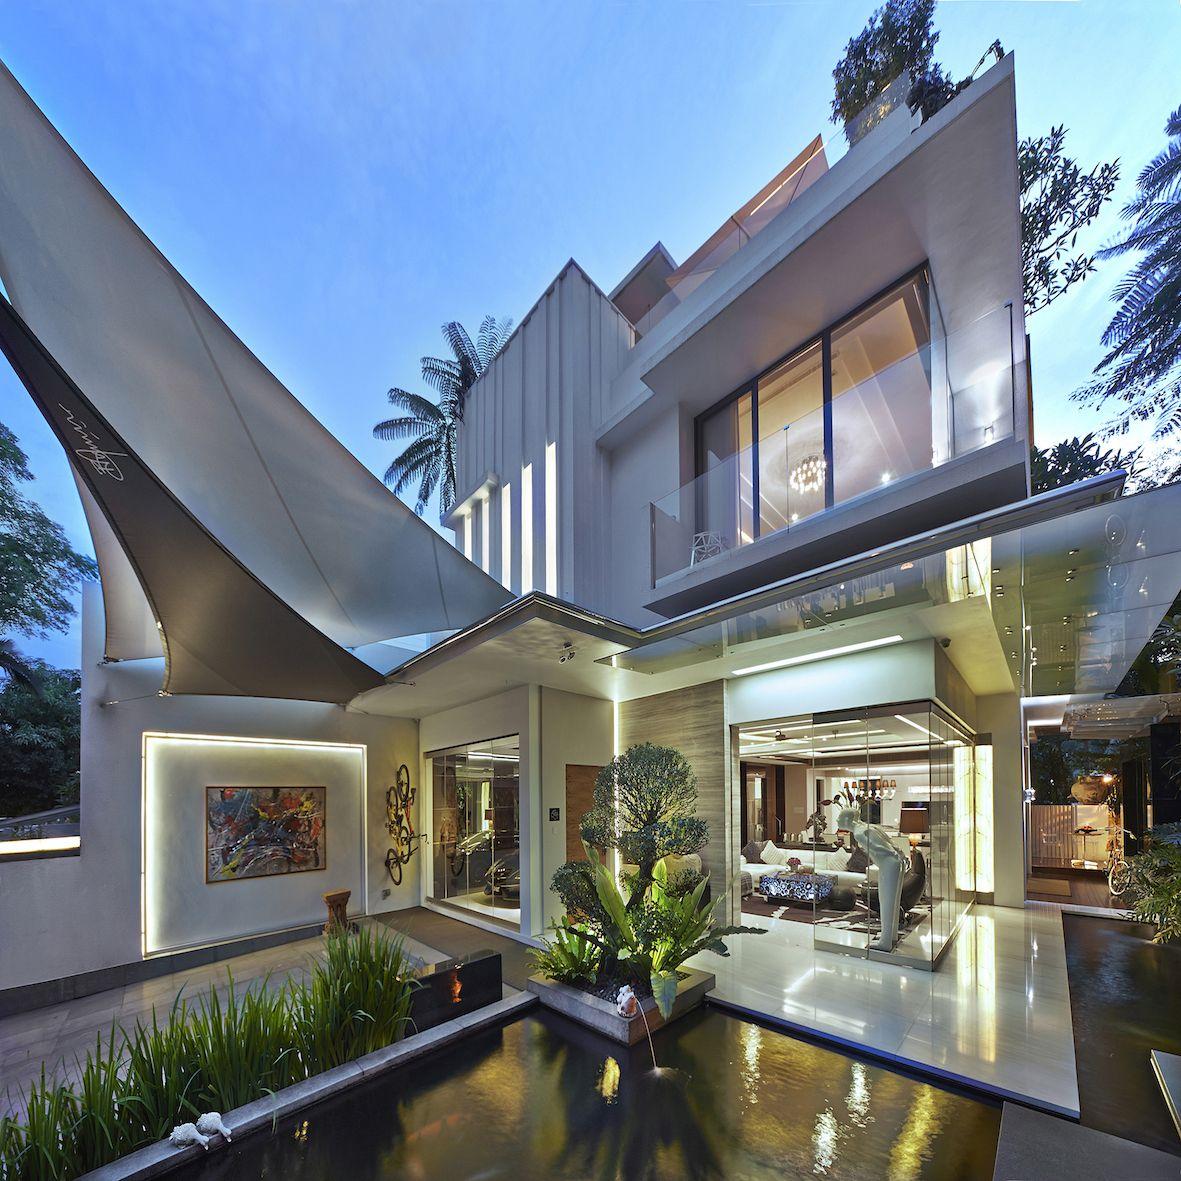 wwwiida intlcomLuxurious Residential designsModern Contemporary Architecture wwwiida intlcomLuxurious